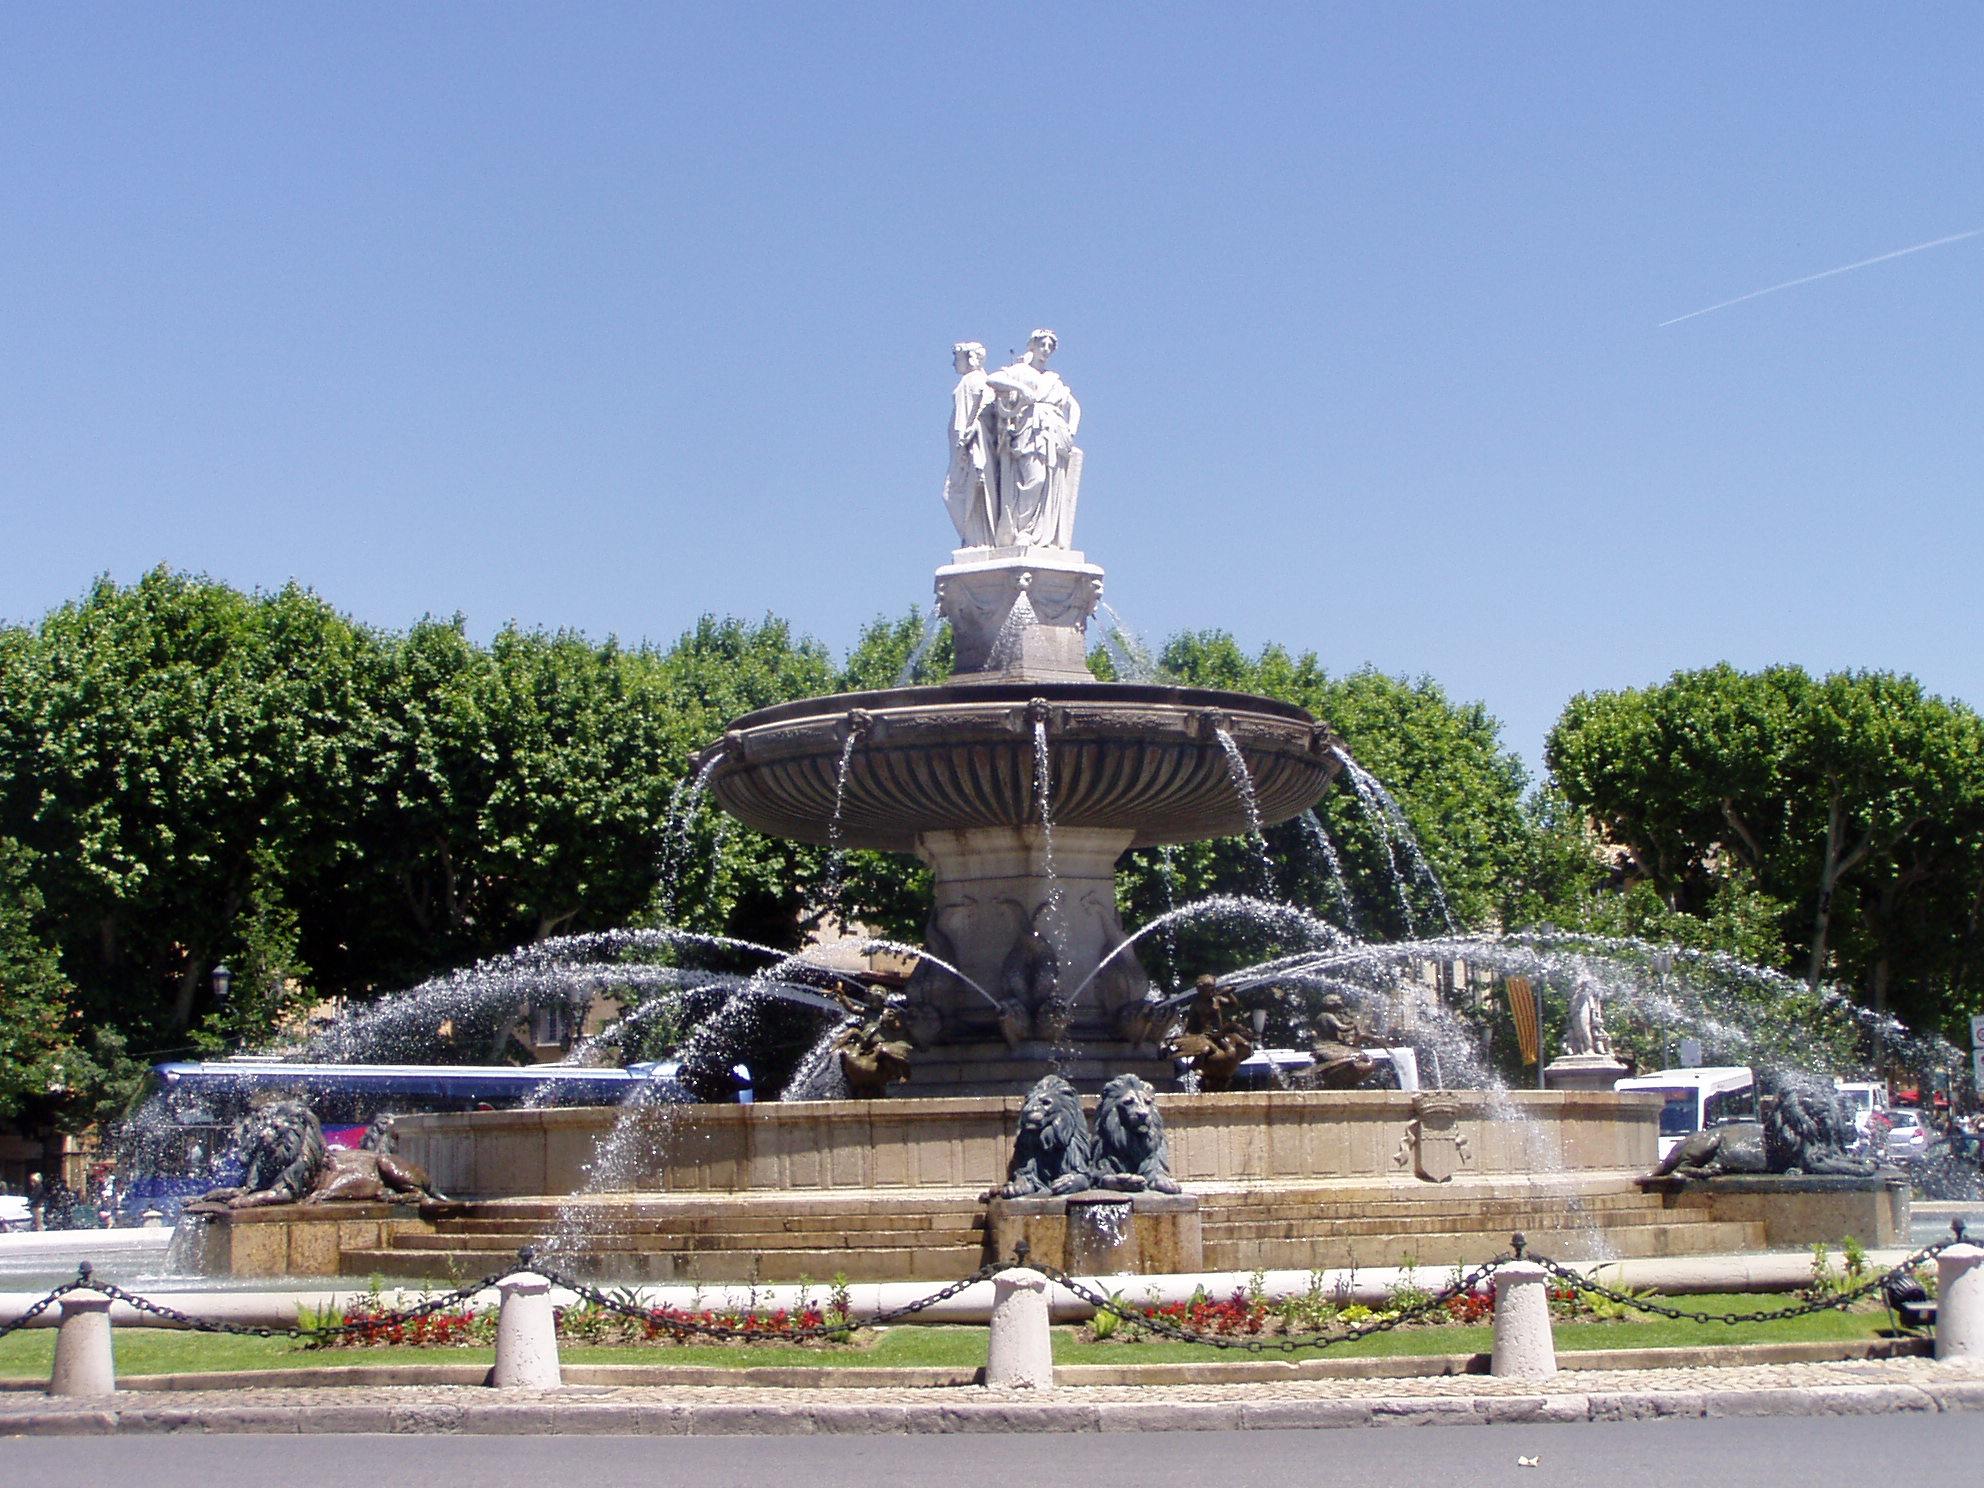 La Rotonde, Aix-en-Provence day tour